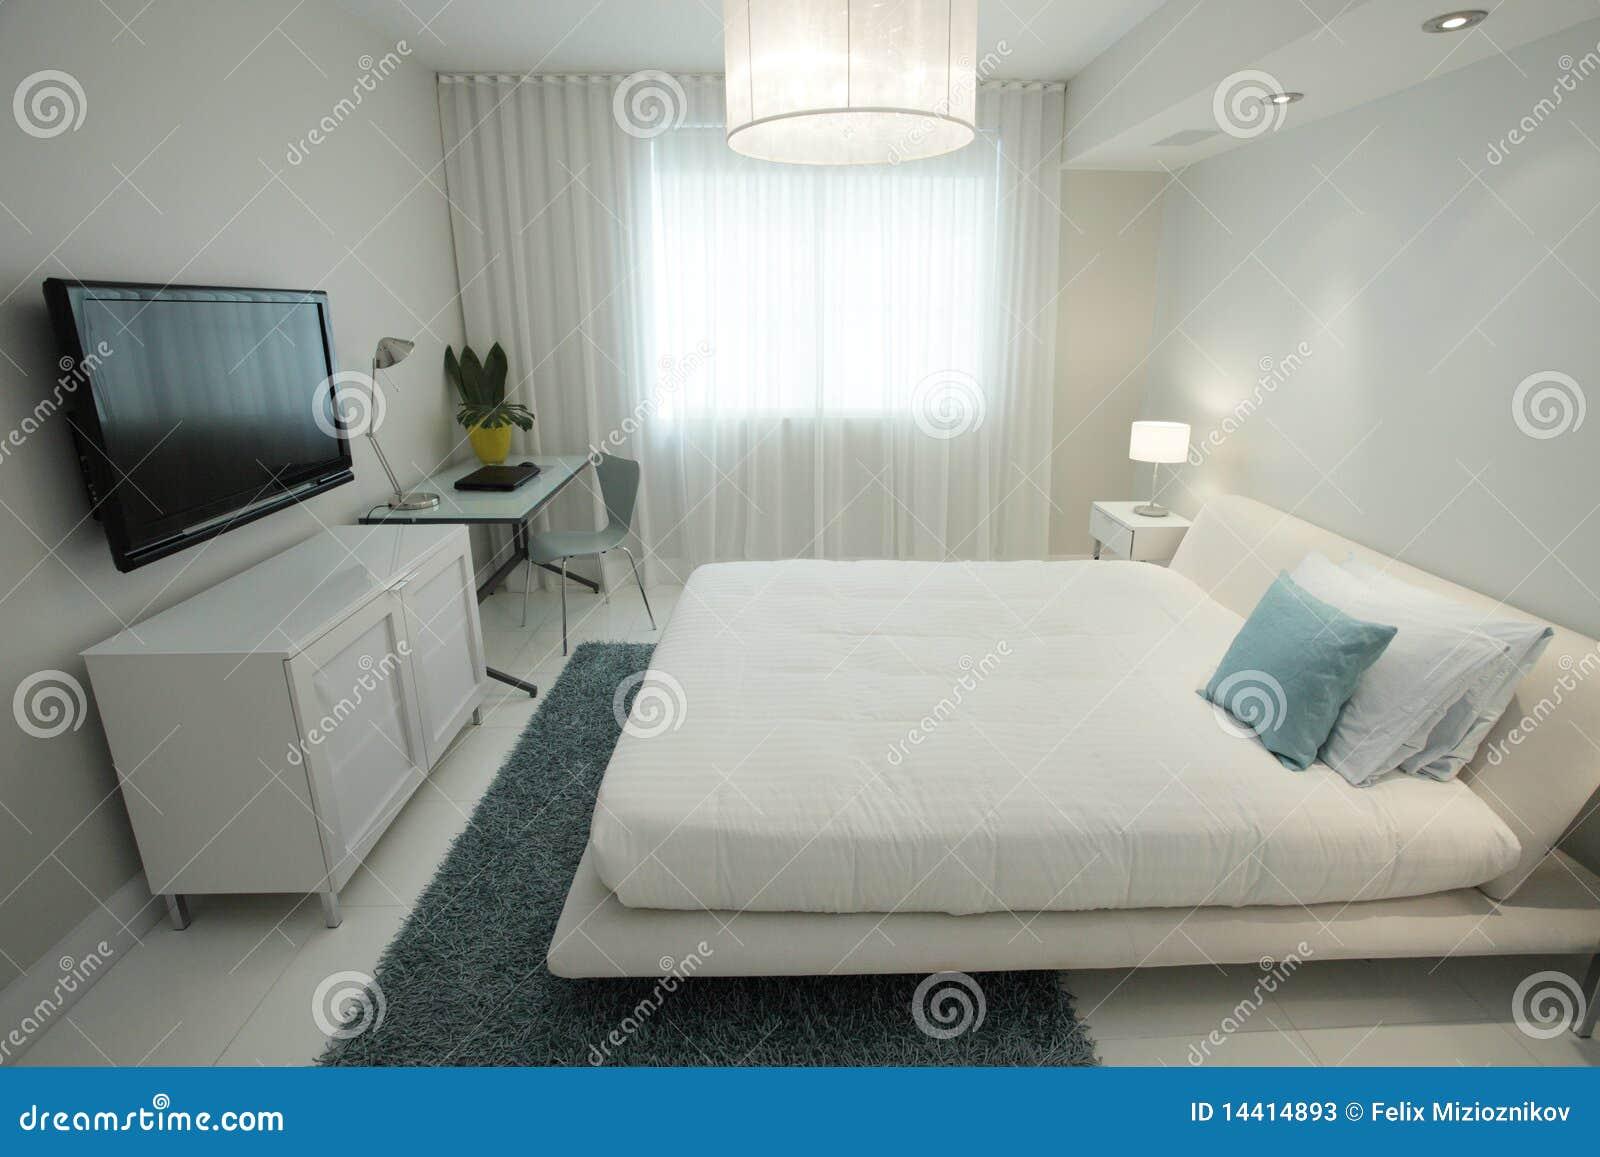 https://thumbs.dreamstime.com/z/slaapkamer-met-een-televisie-hd-14414893.jpg